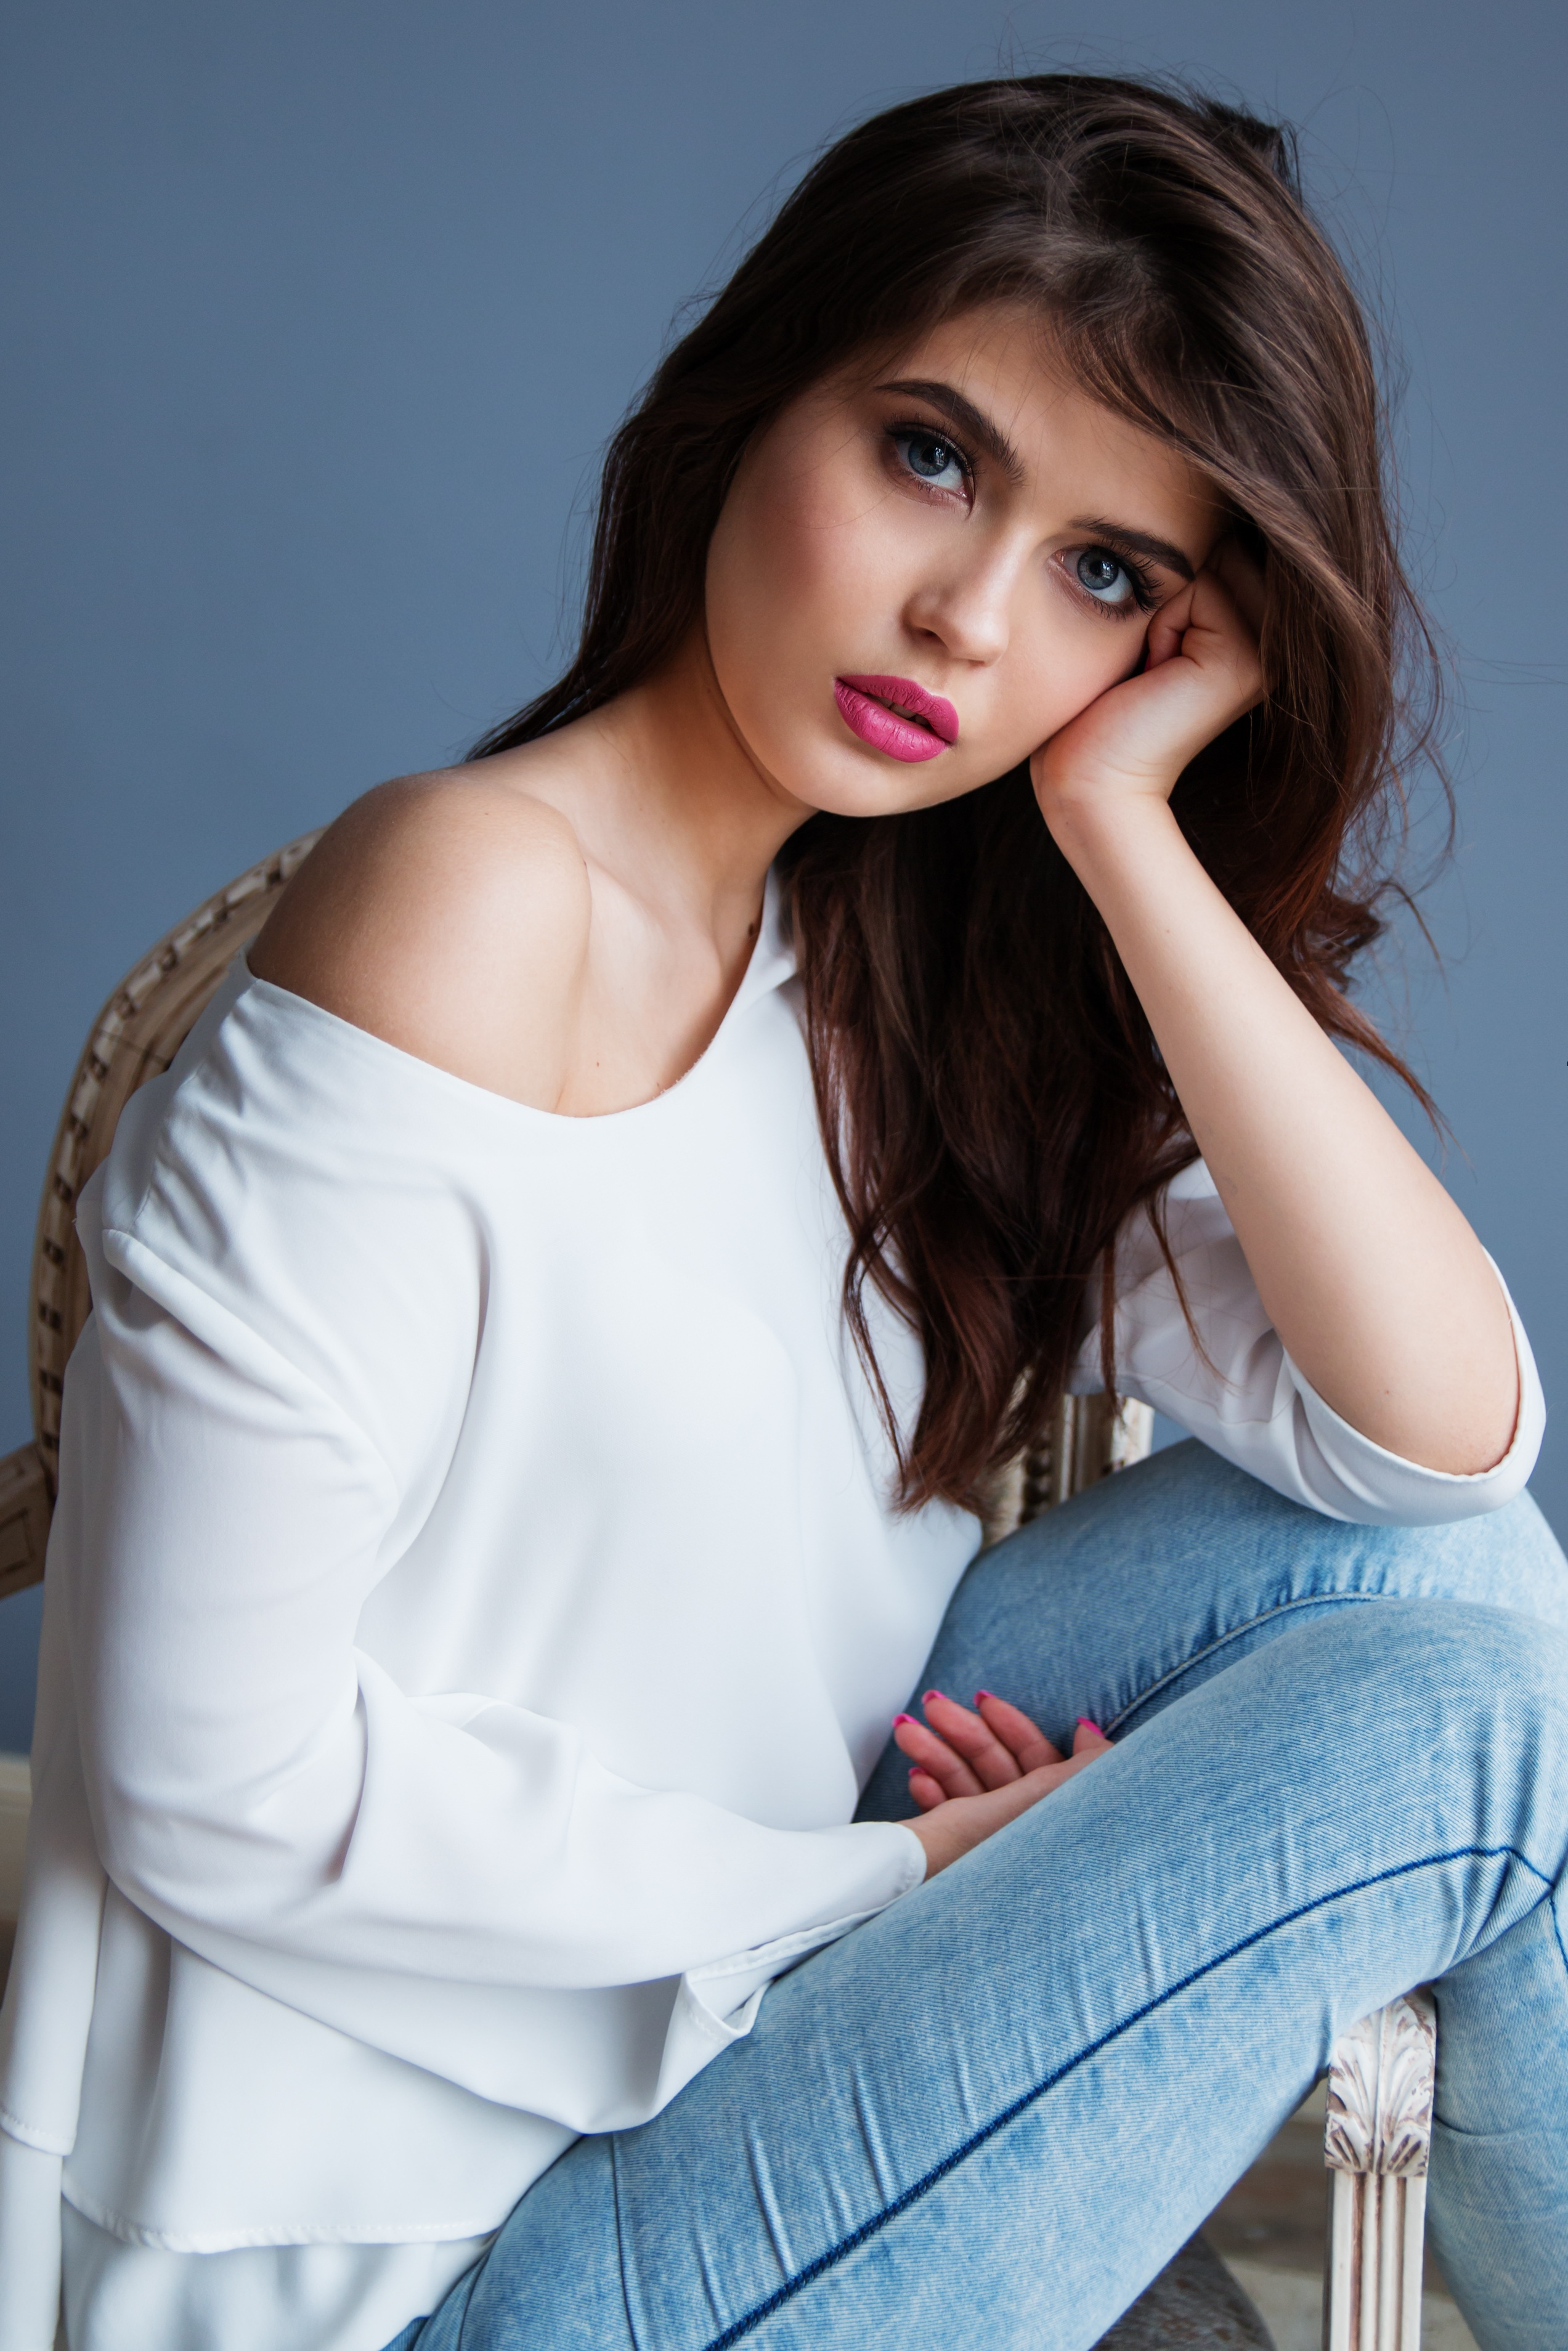 Model Girl, Portrait, Pose, Woman, Photoshoot, HQ Photo